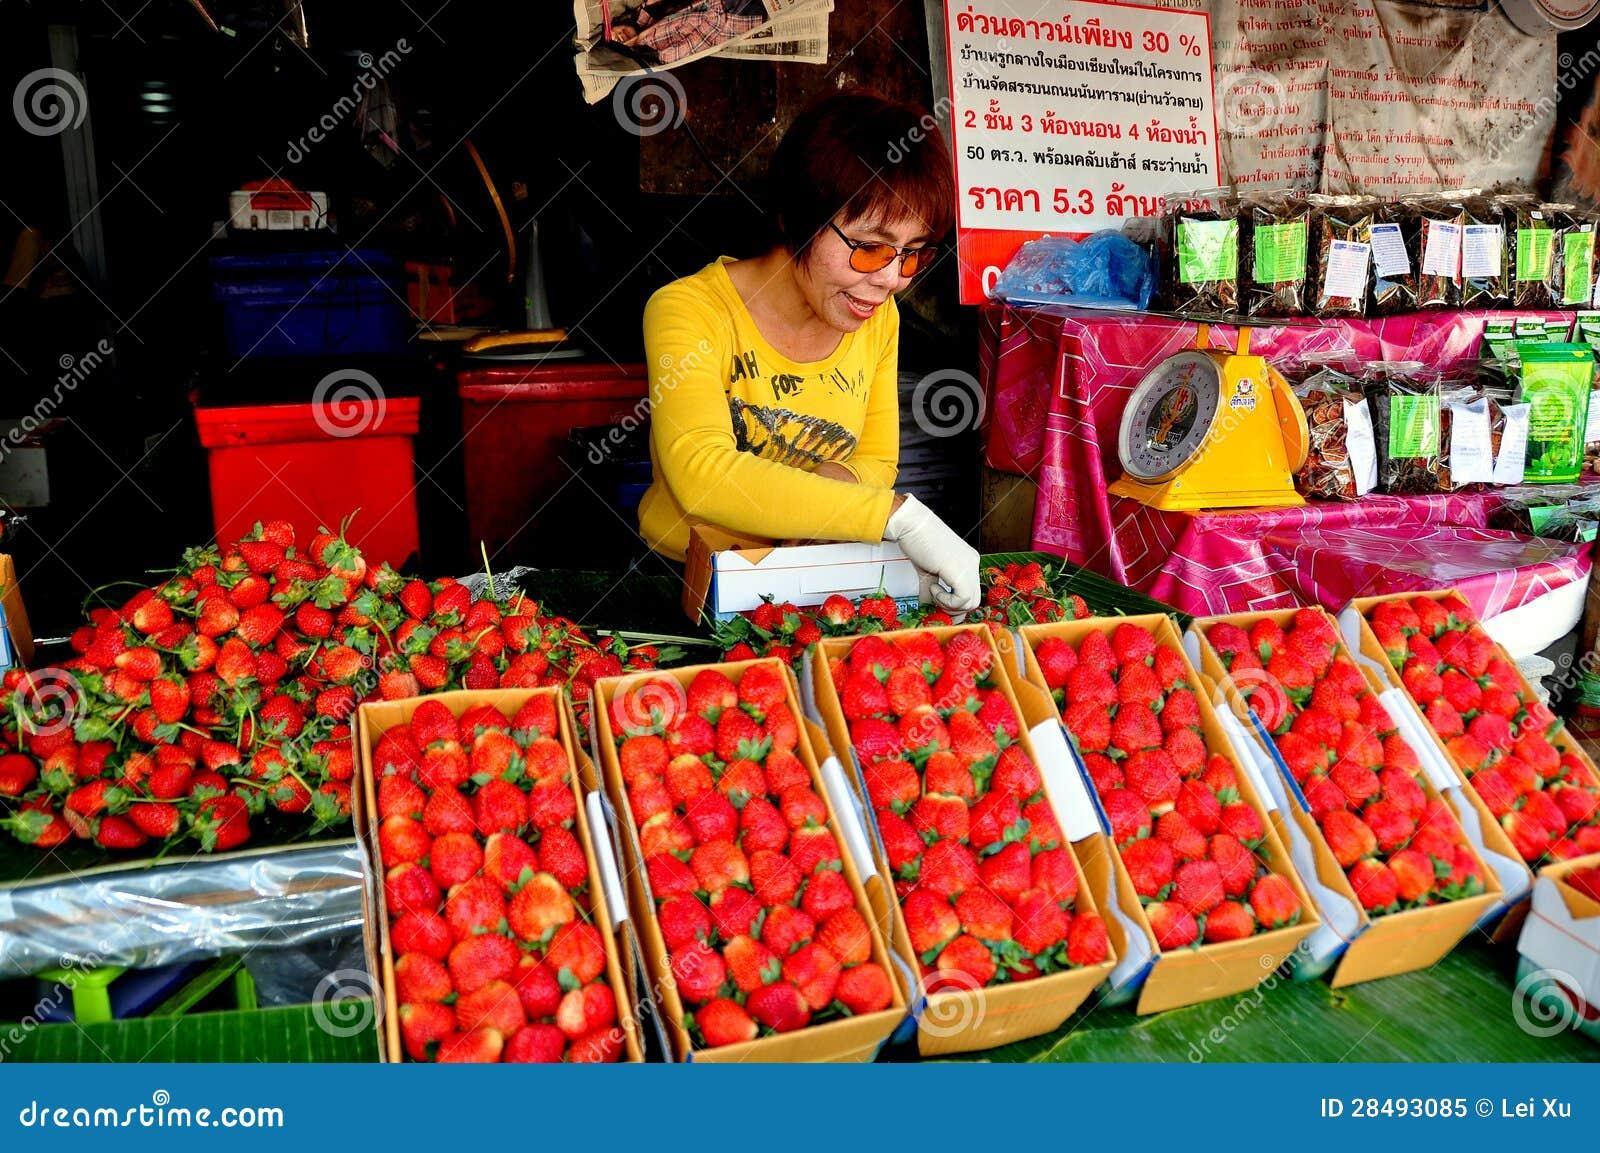 chiang-mai-thailand-woman-selling-strawb